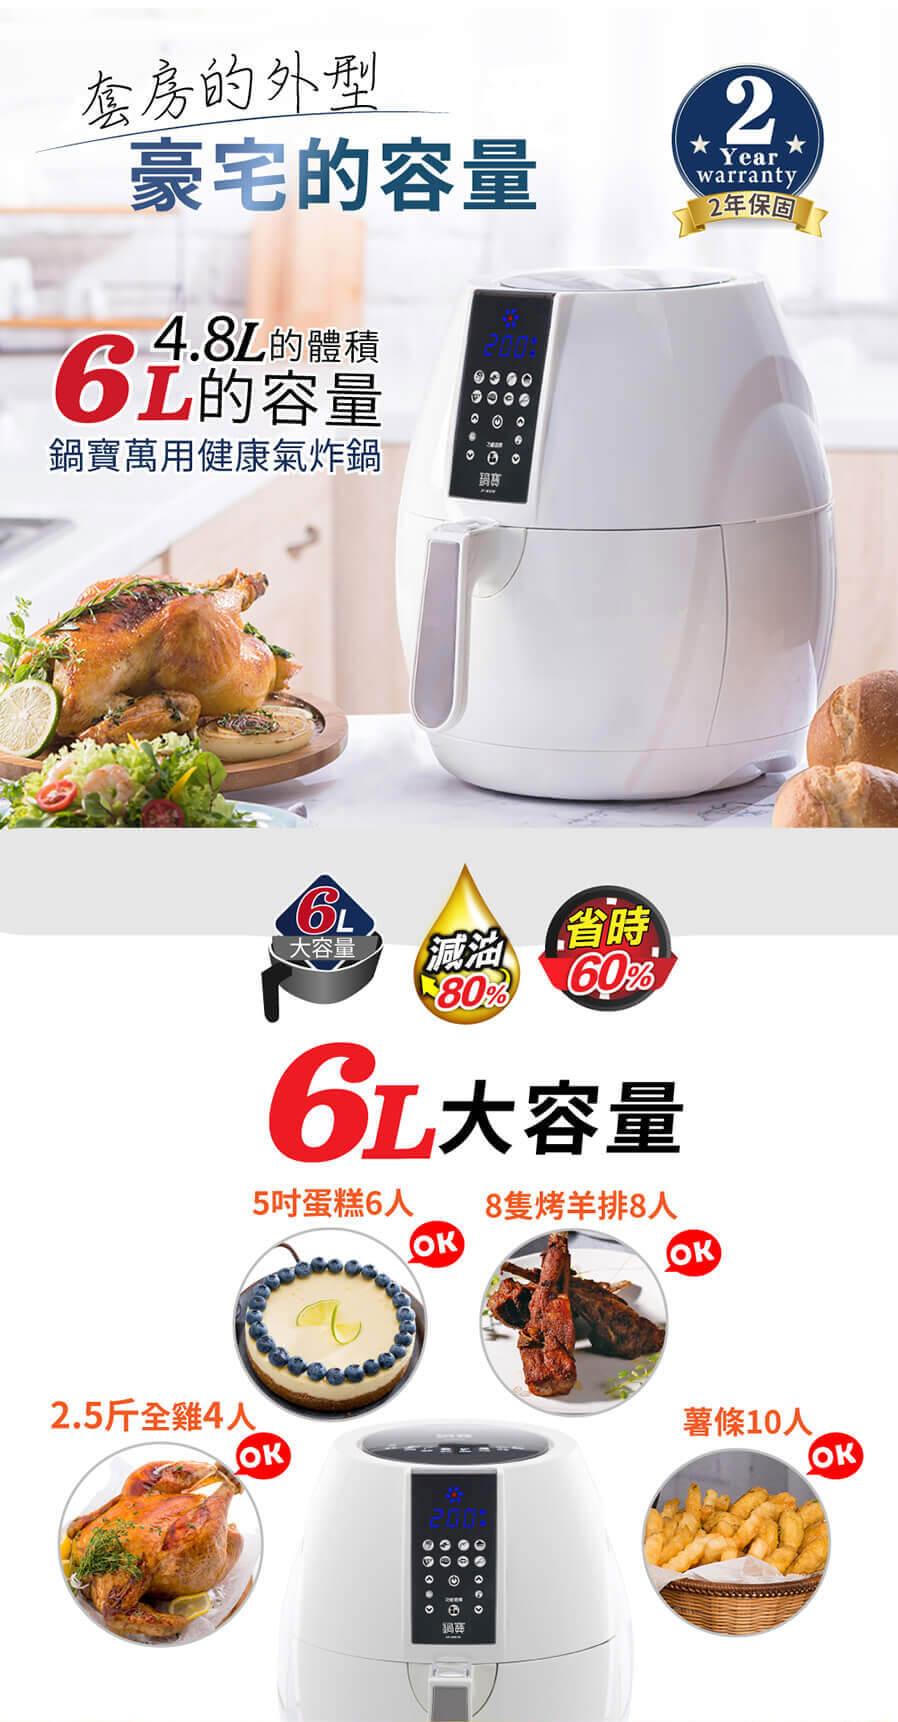 CookPower鍋寶 6L數位觸控健康氣炸鍋